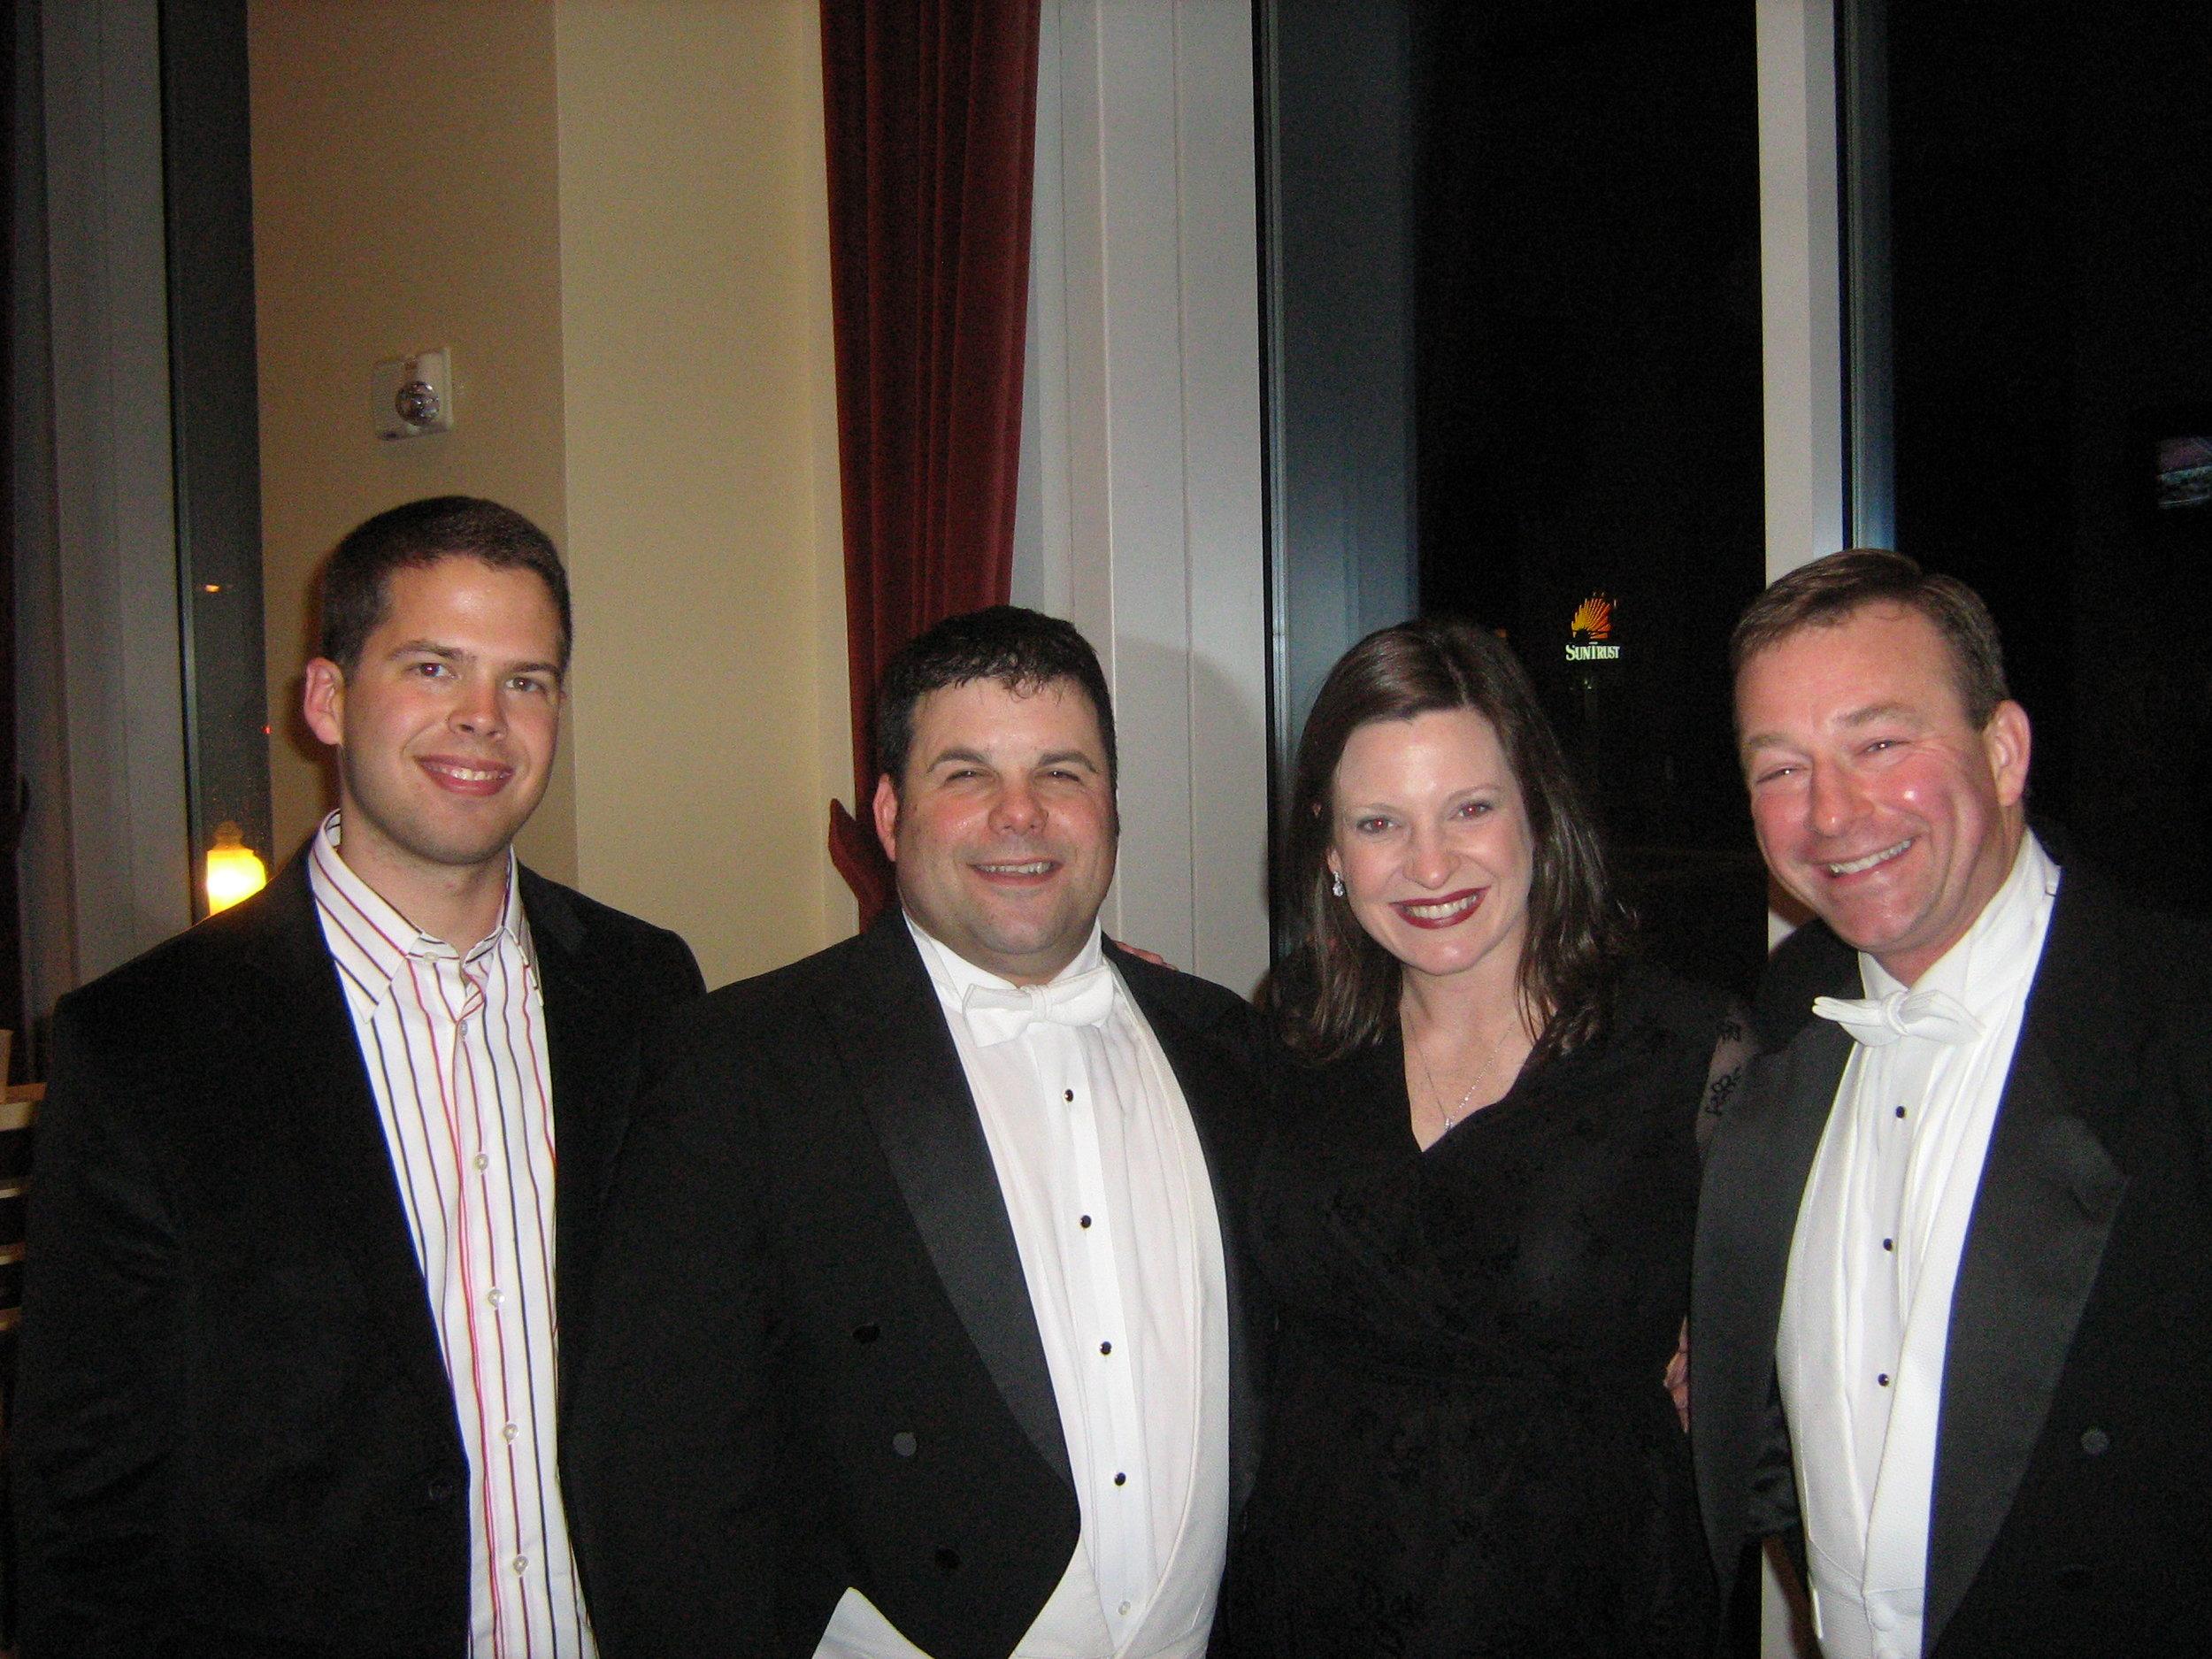 Will Pitts, Robert Ambrose, Laura Stanley.JPG